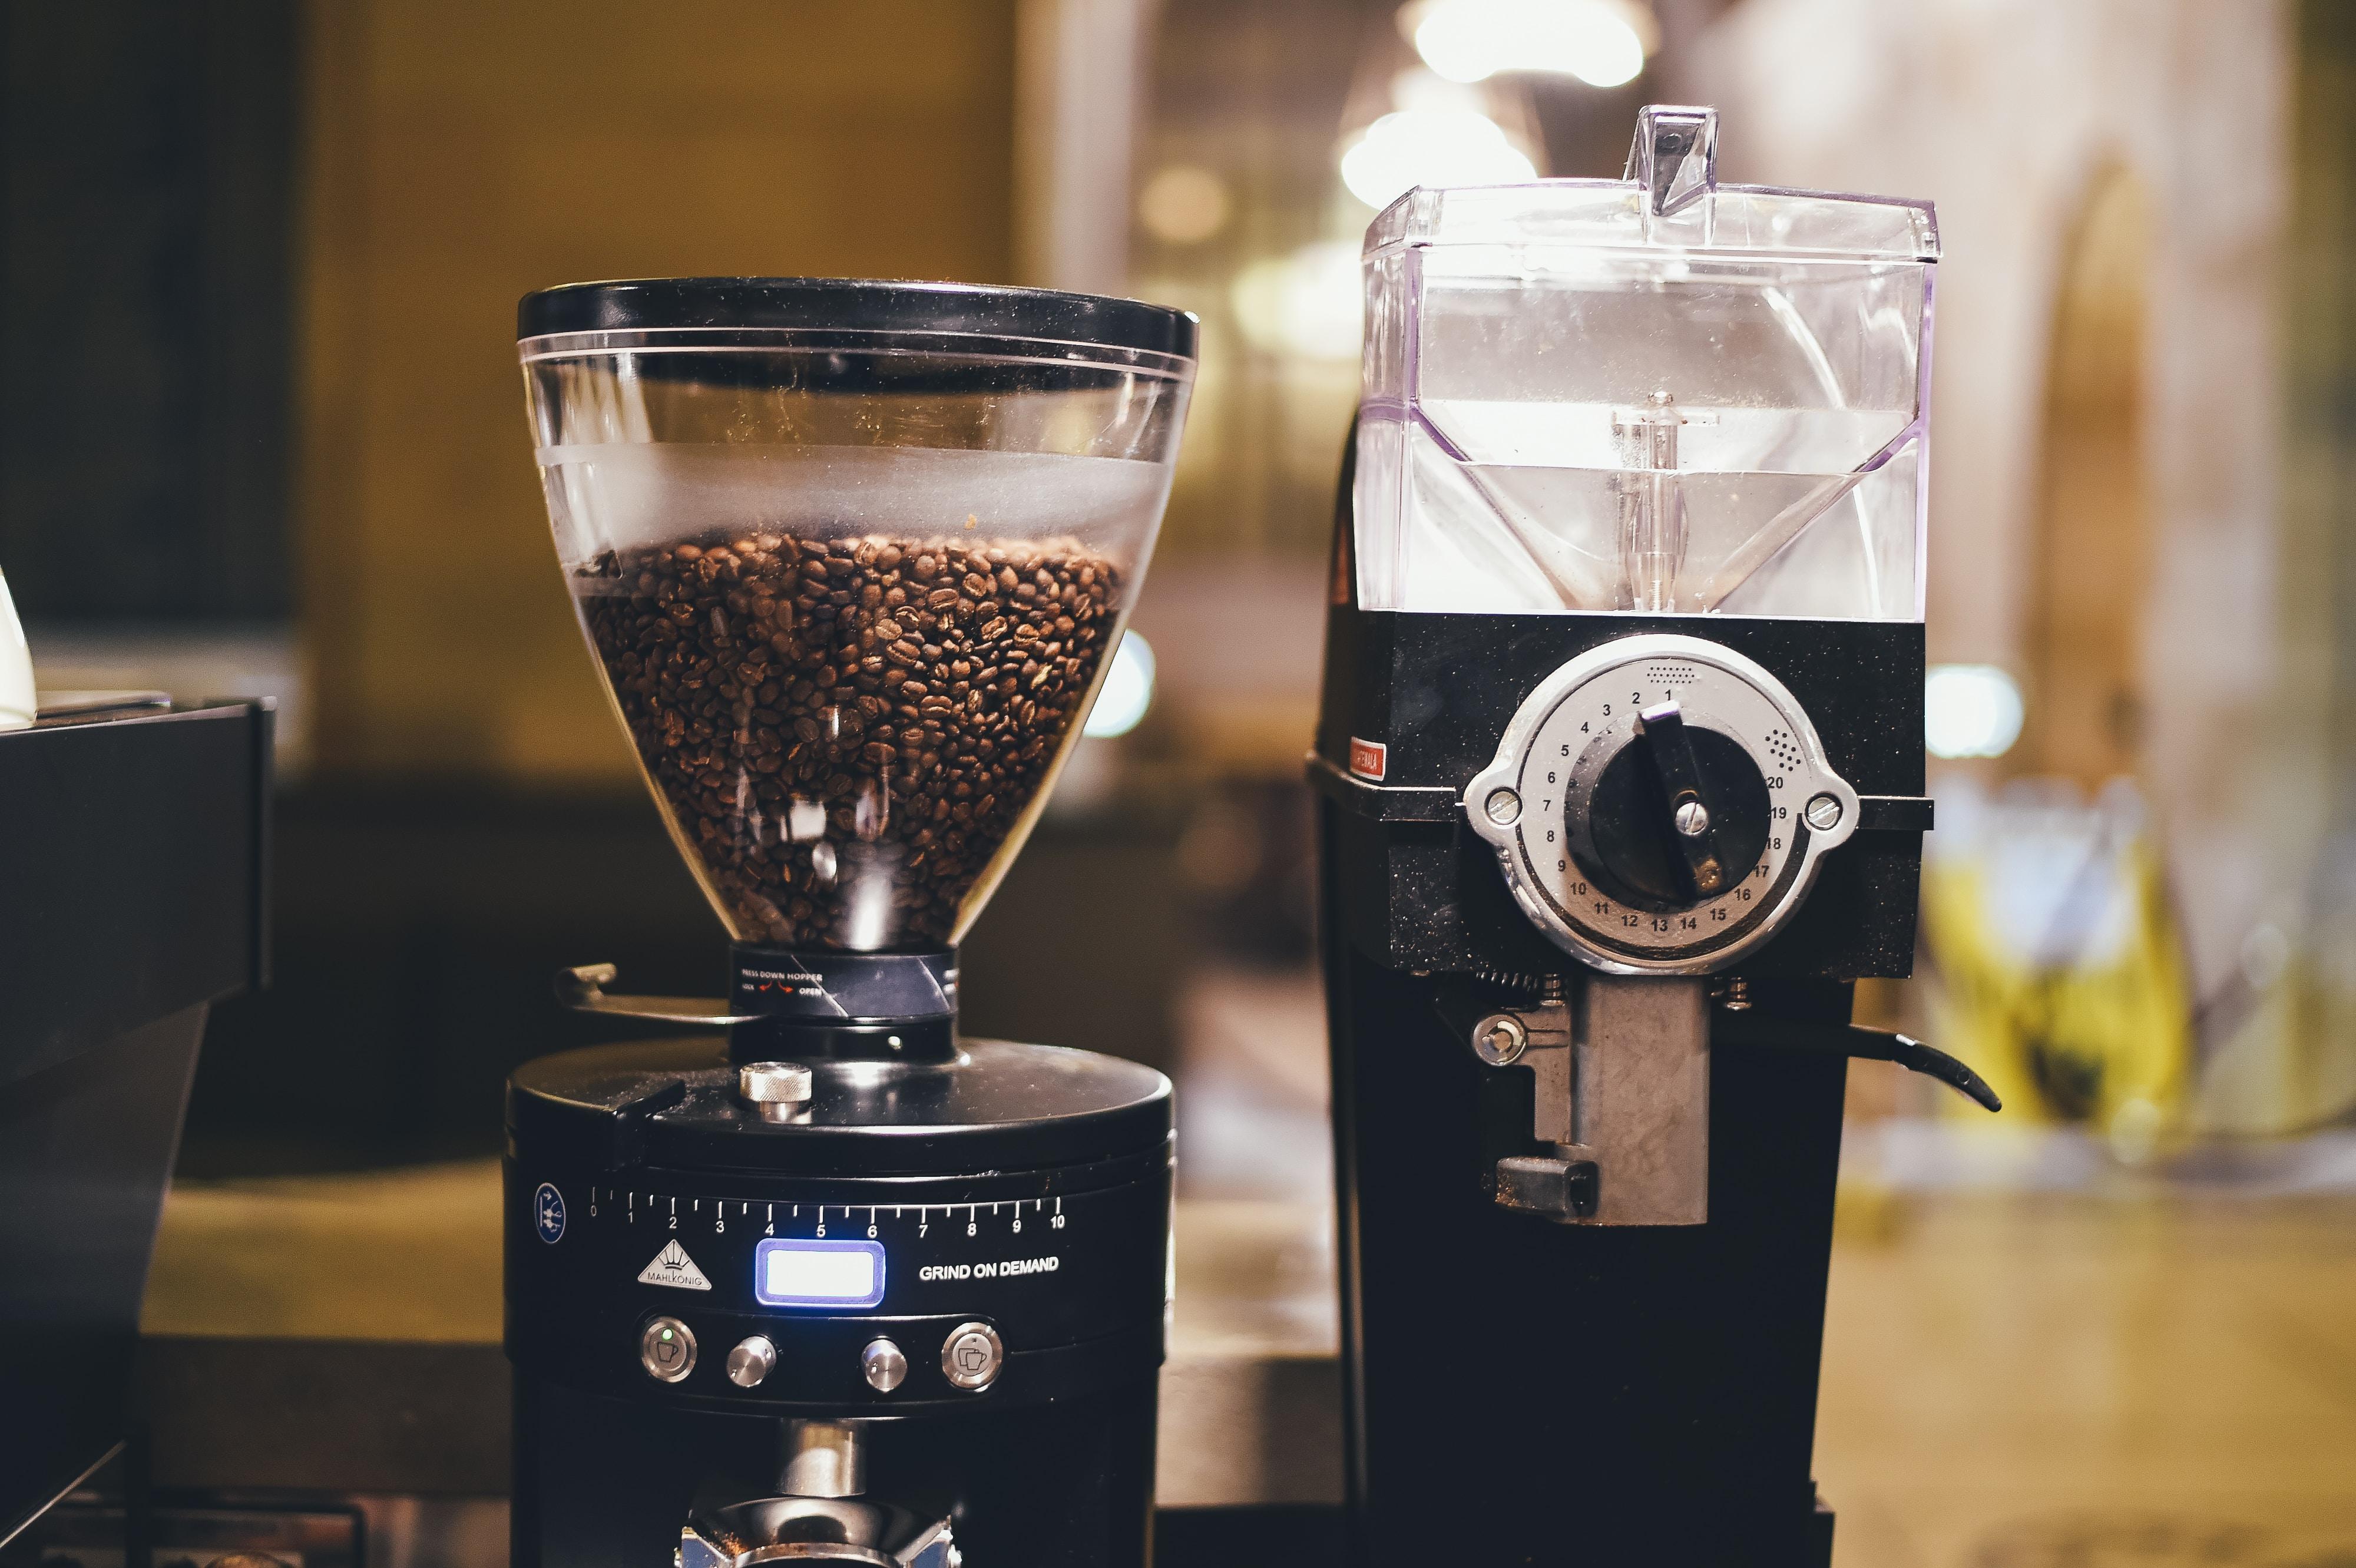 black coffee maker